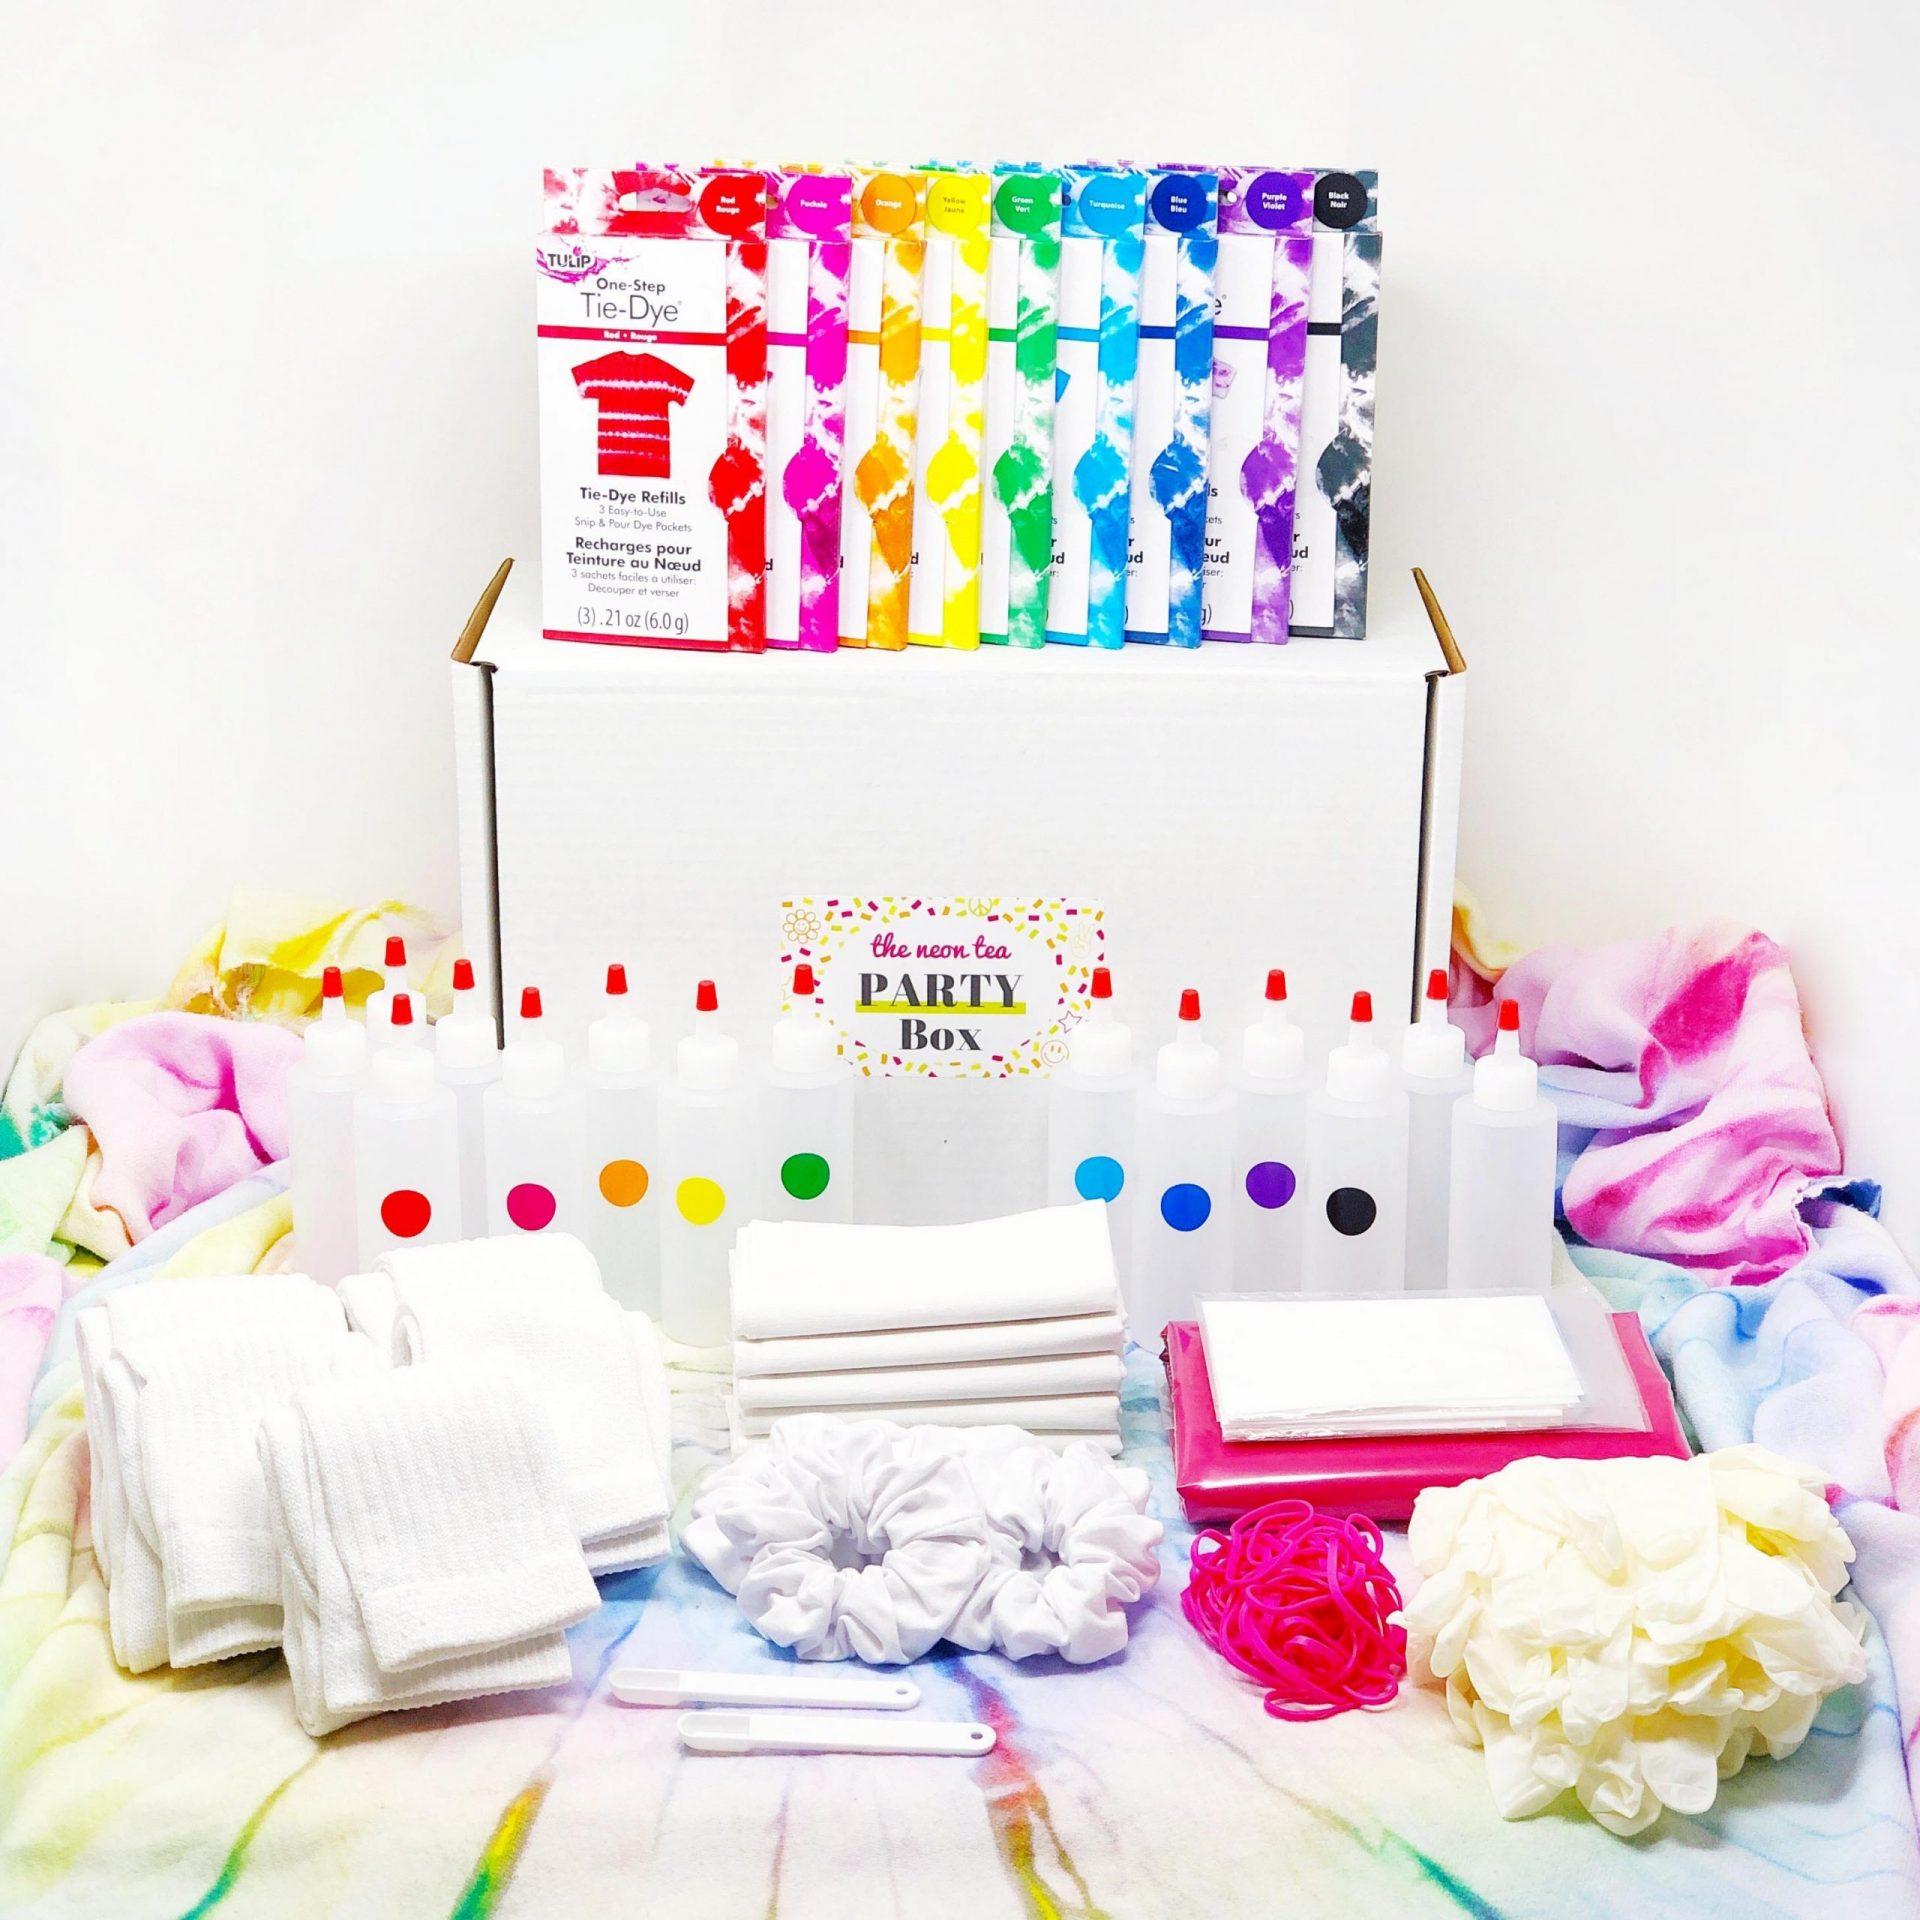 Party Box - Tie Dye - Hero